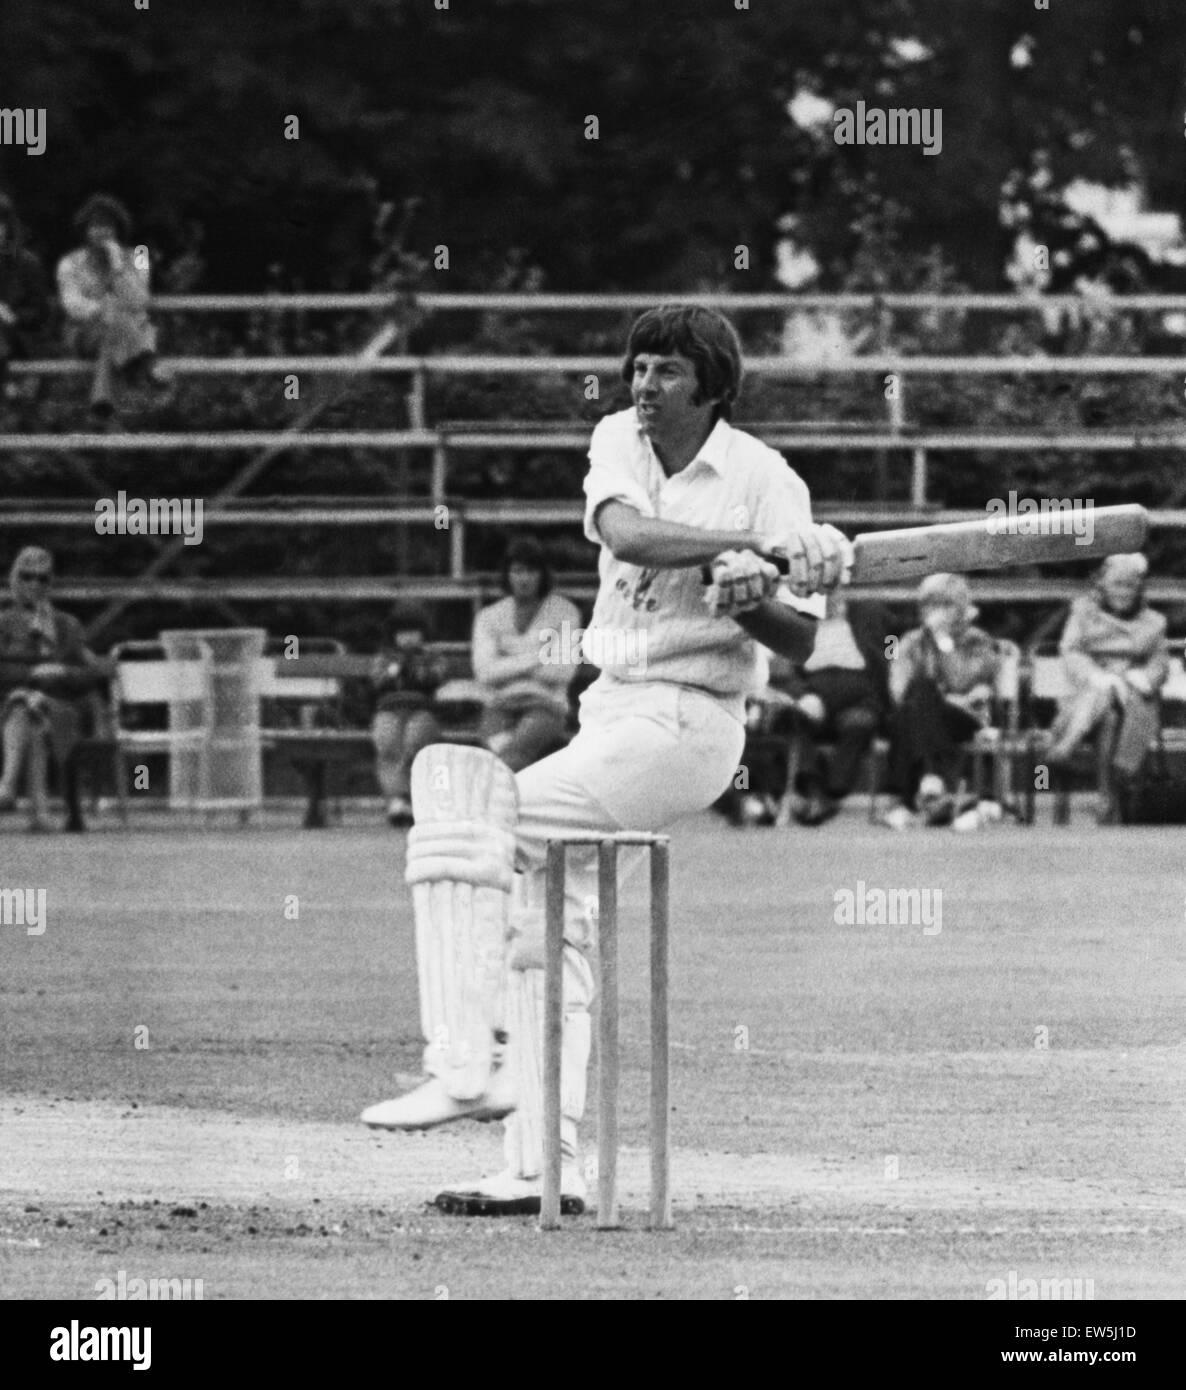 Glamorgan's batsman Roger Davis hits a ball against Warwickshire at Sophia Gardens. Circa 1973. - Stock Image